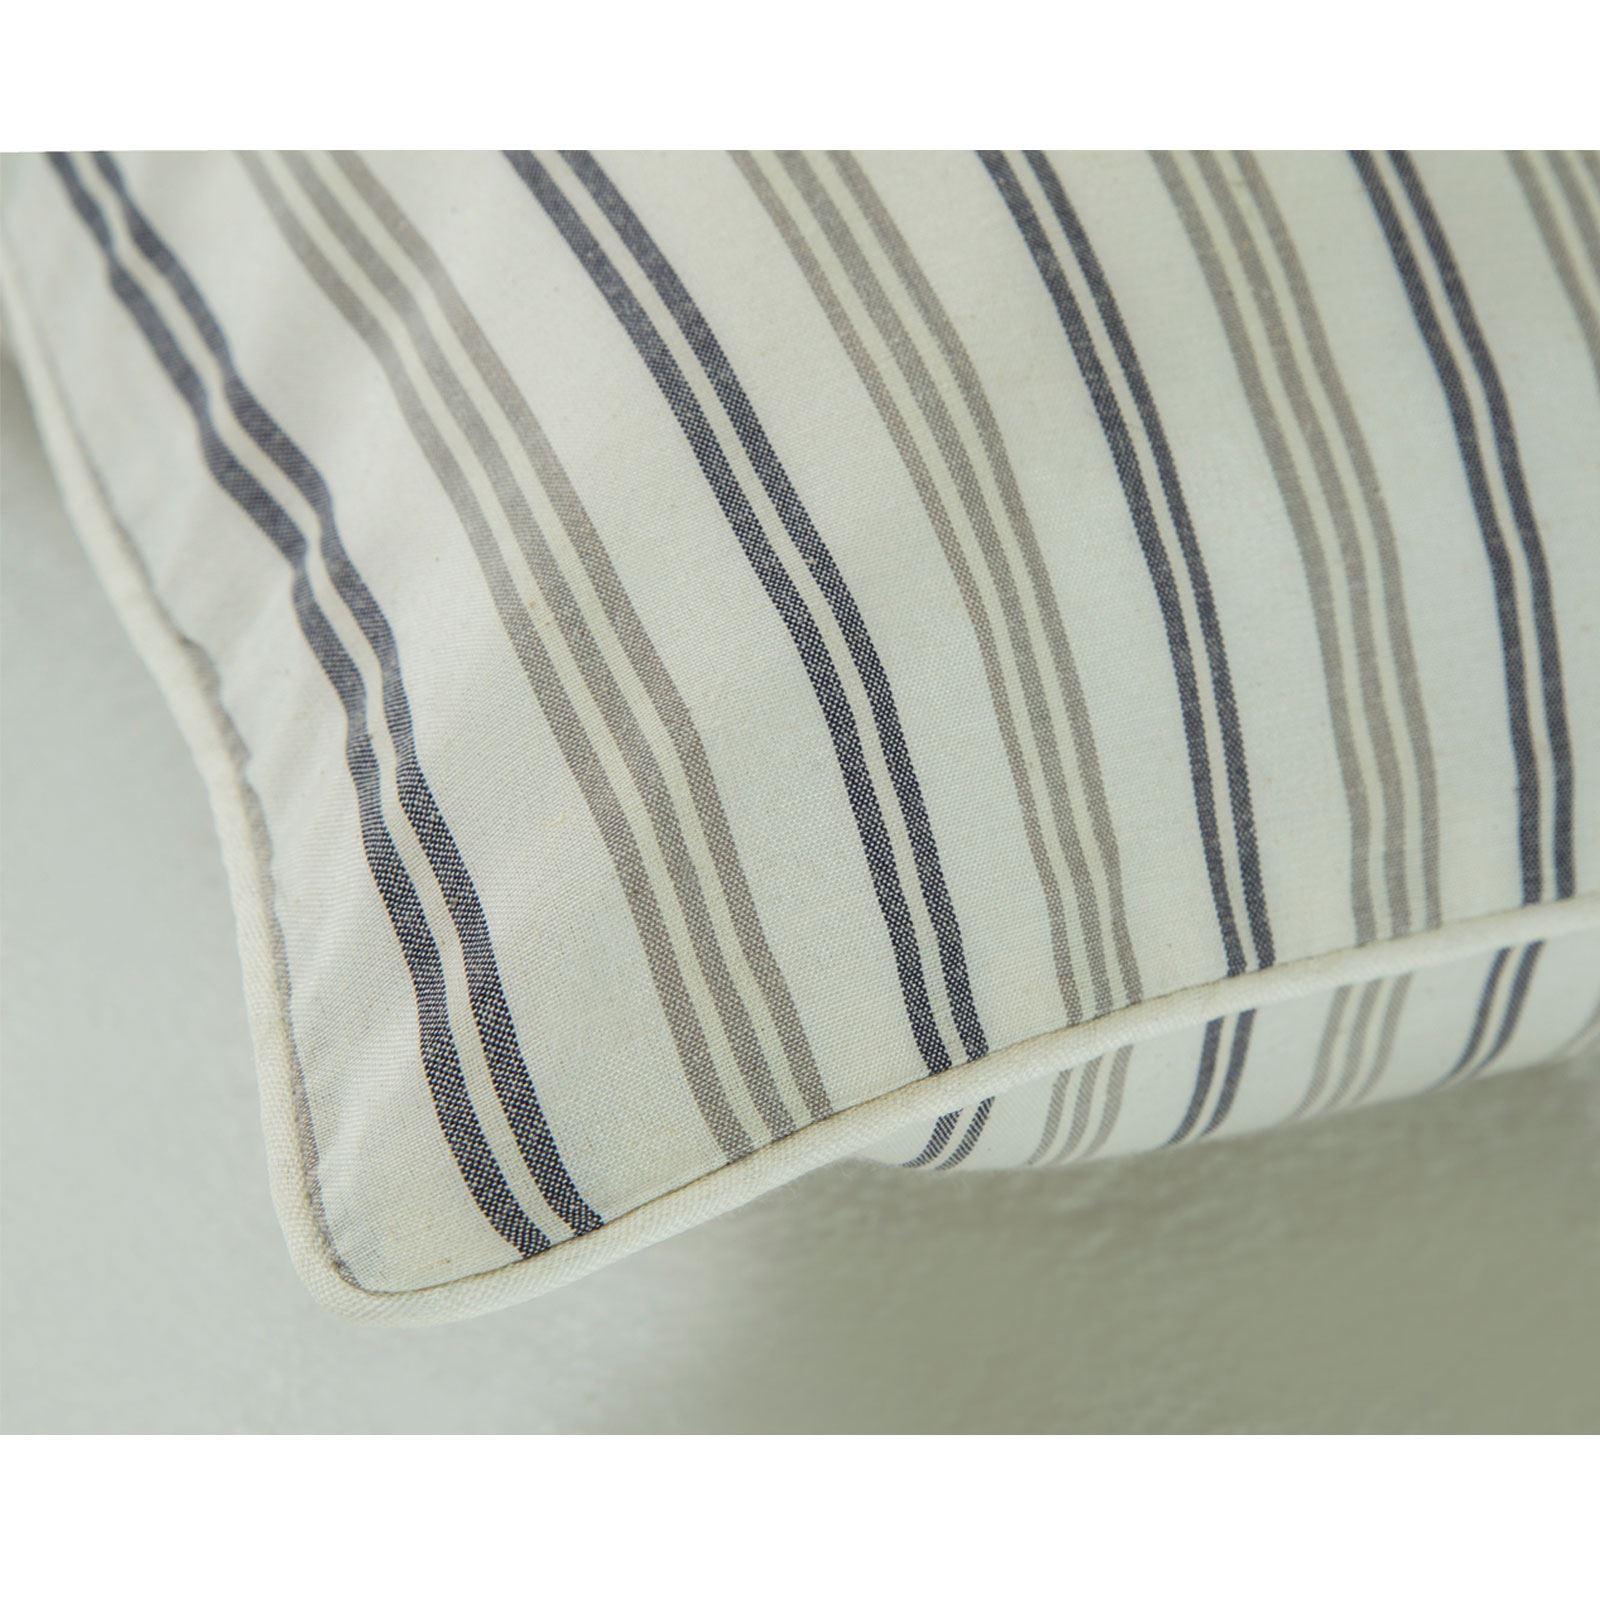 Hilo-de-algodon-de-lujo-Rico-Suave-Chambray-tenido-de-Cubierta-de-edredon-a-rayas-de-tejido-a-rayas miniatura 13